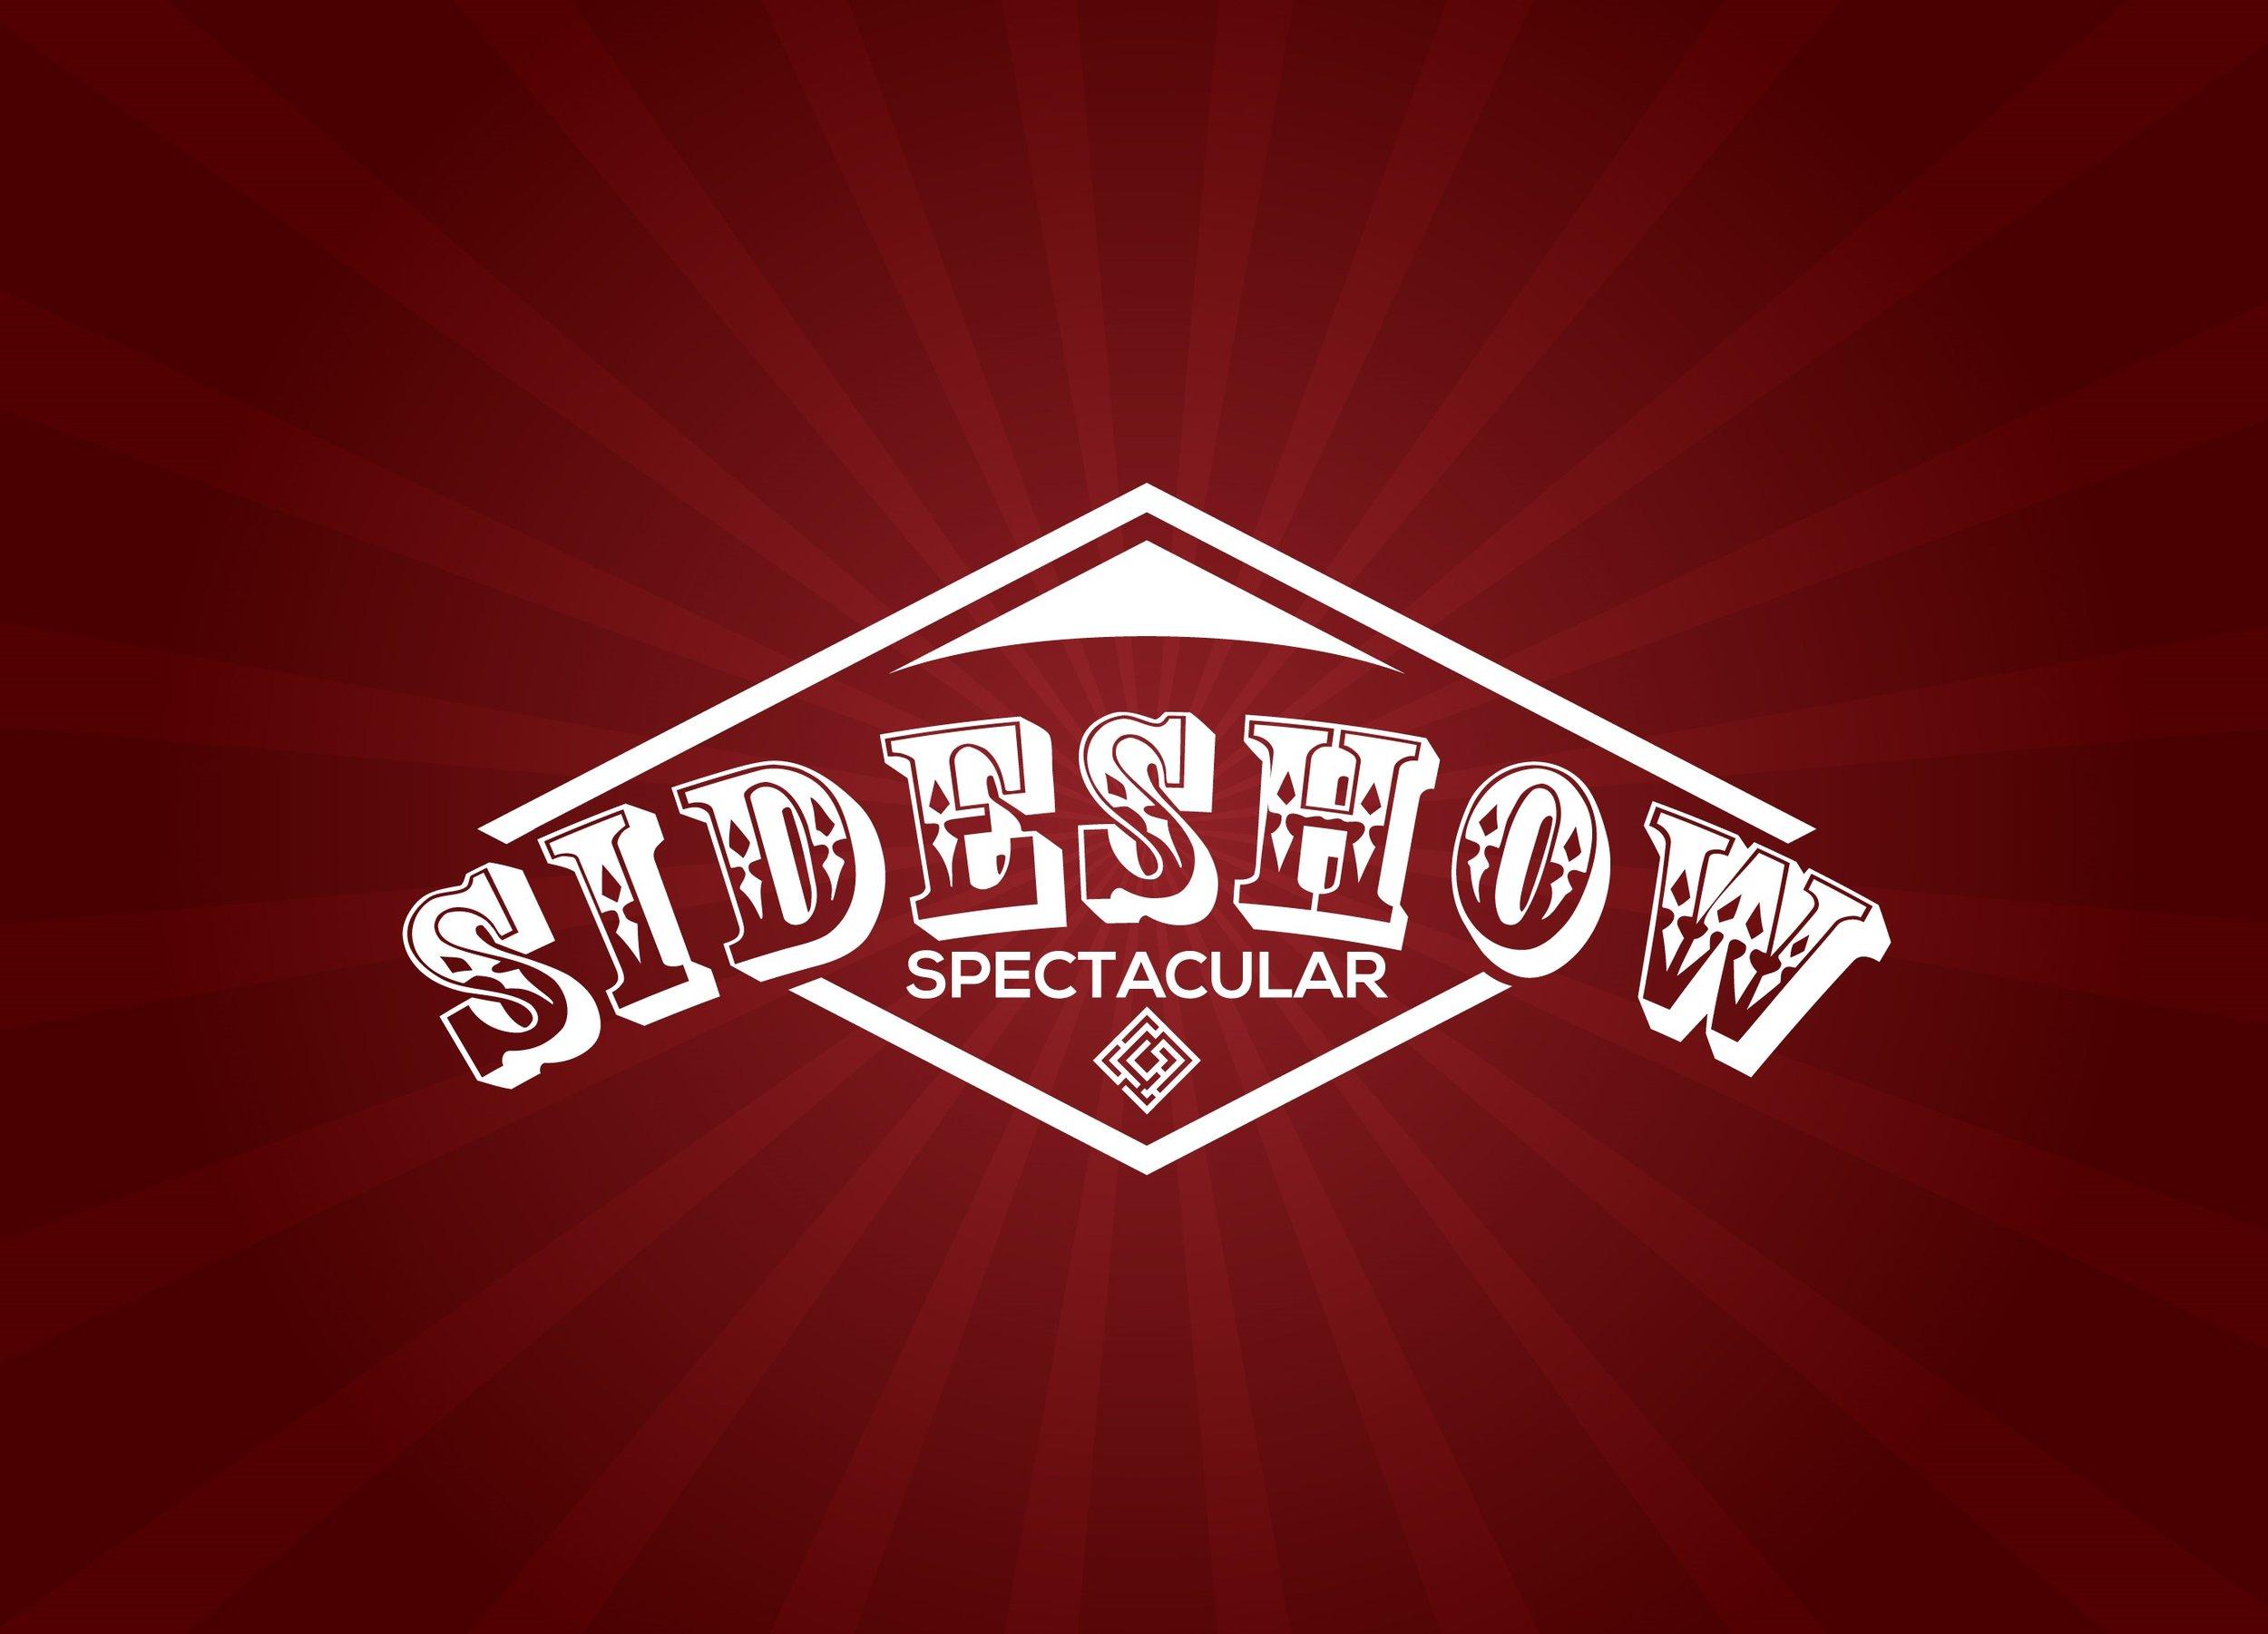 SIDESHOW SPECTACULAR 3.jpg